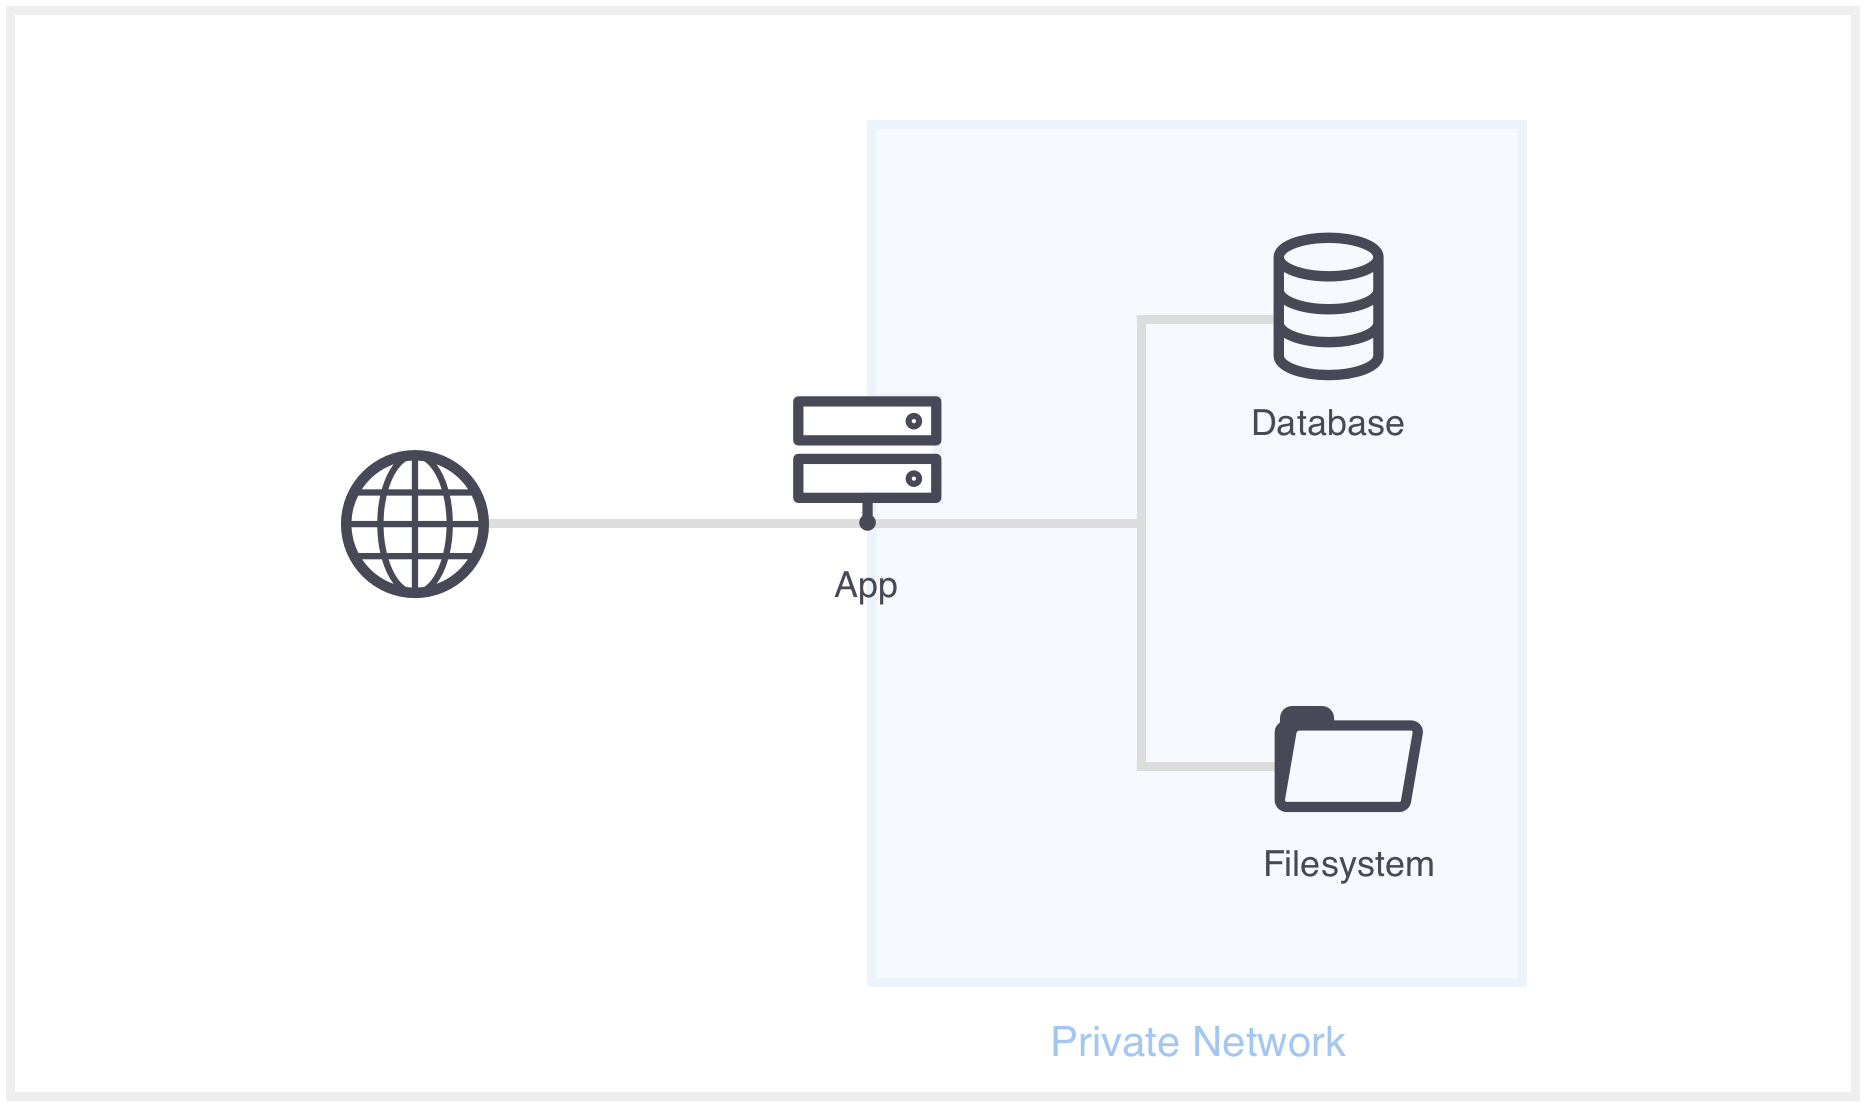 Current server architecture